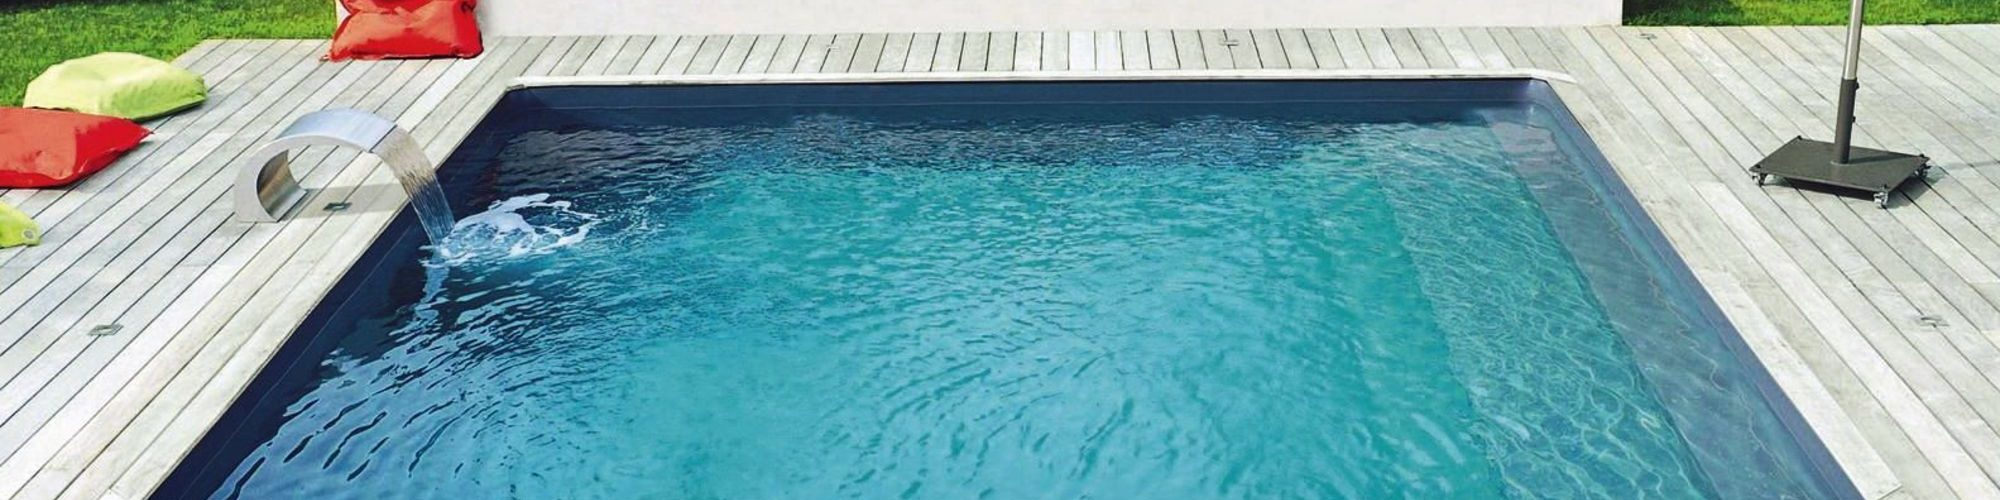 construire soi même une piscine